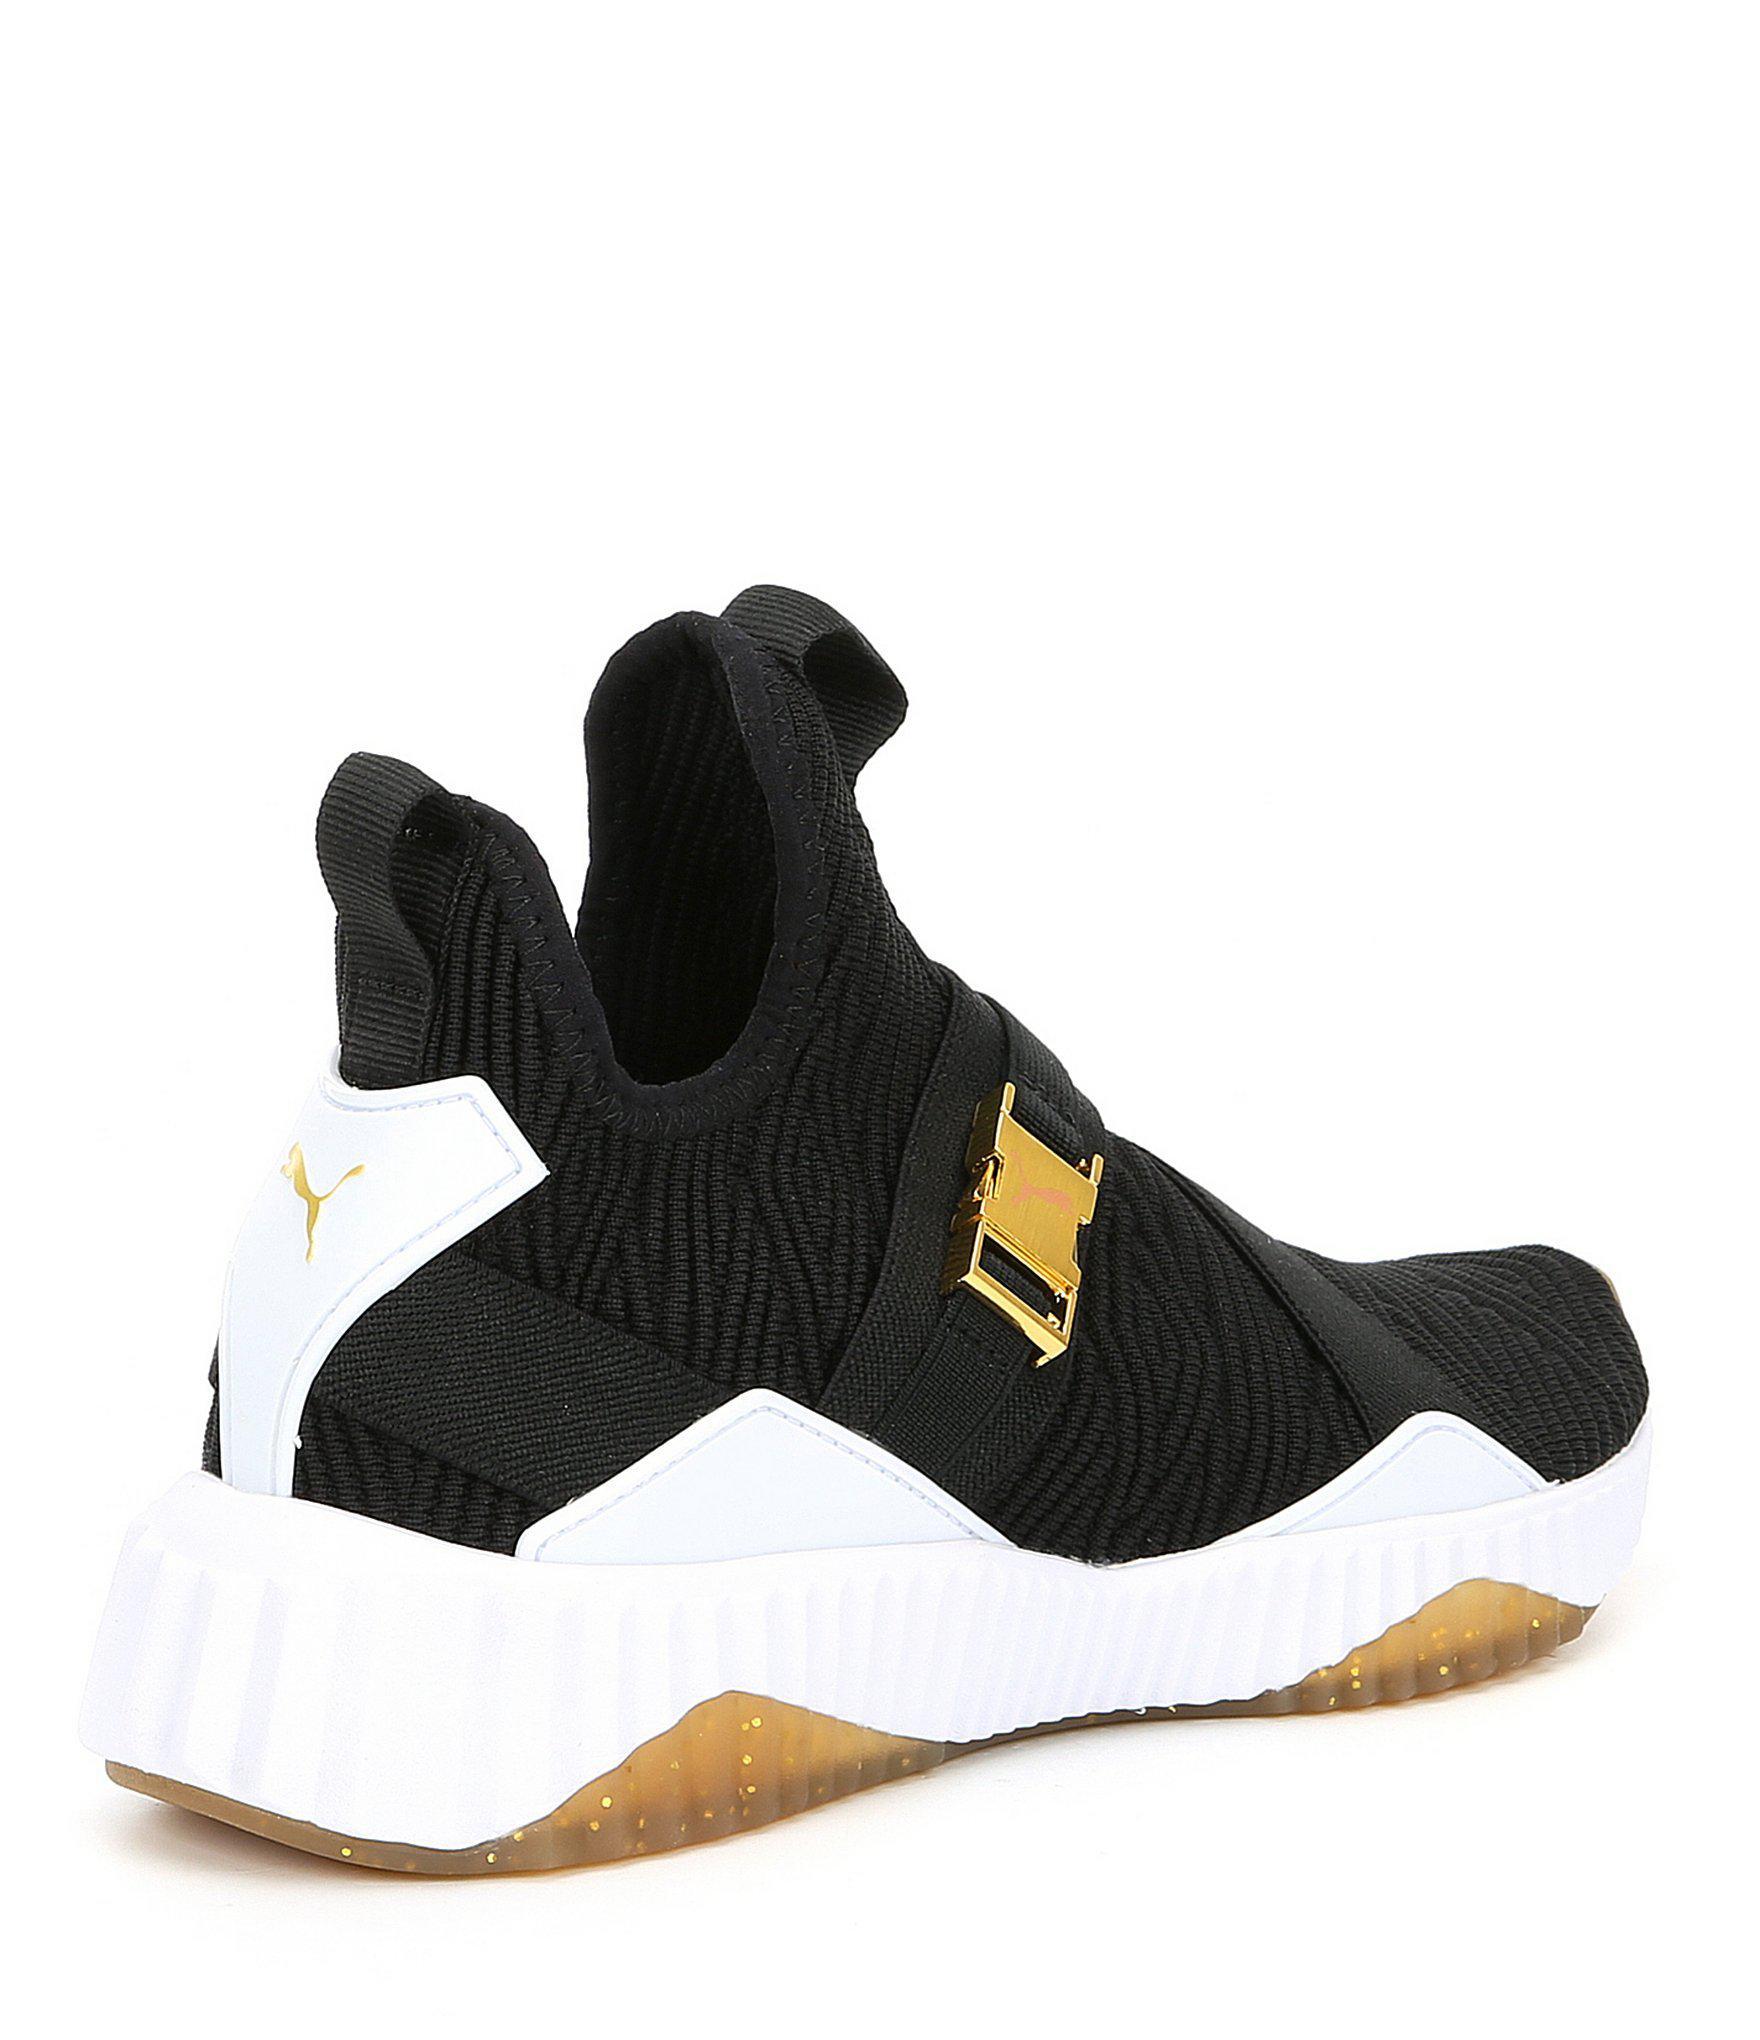 PUMA - Black Women s Defy Mid Varsity Sneakers - Lyst. View fullscreen a22e8f34f